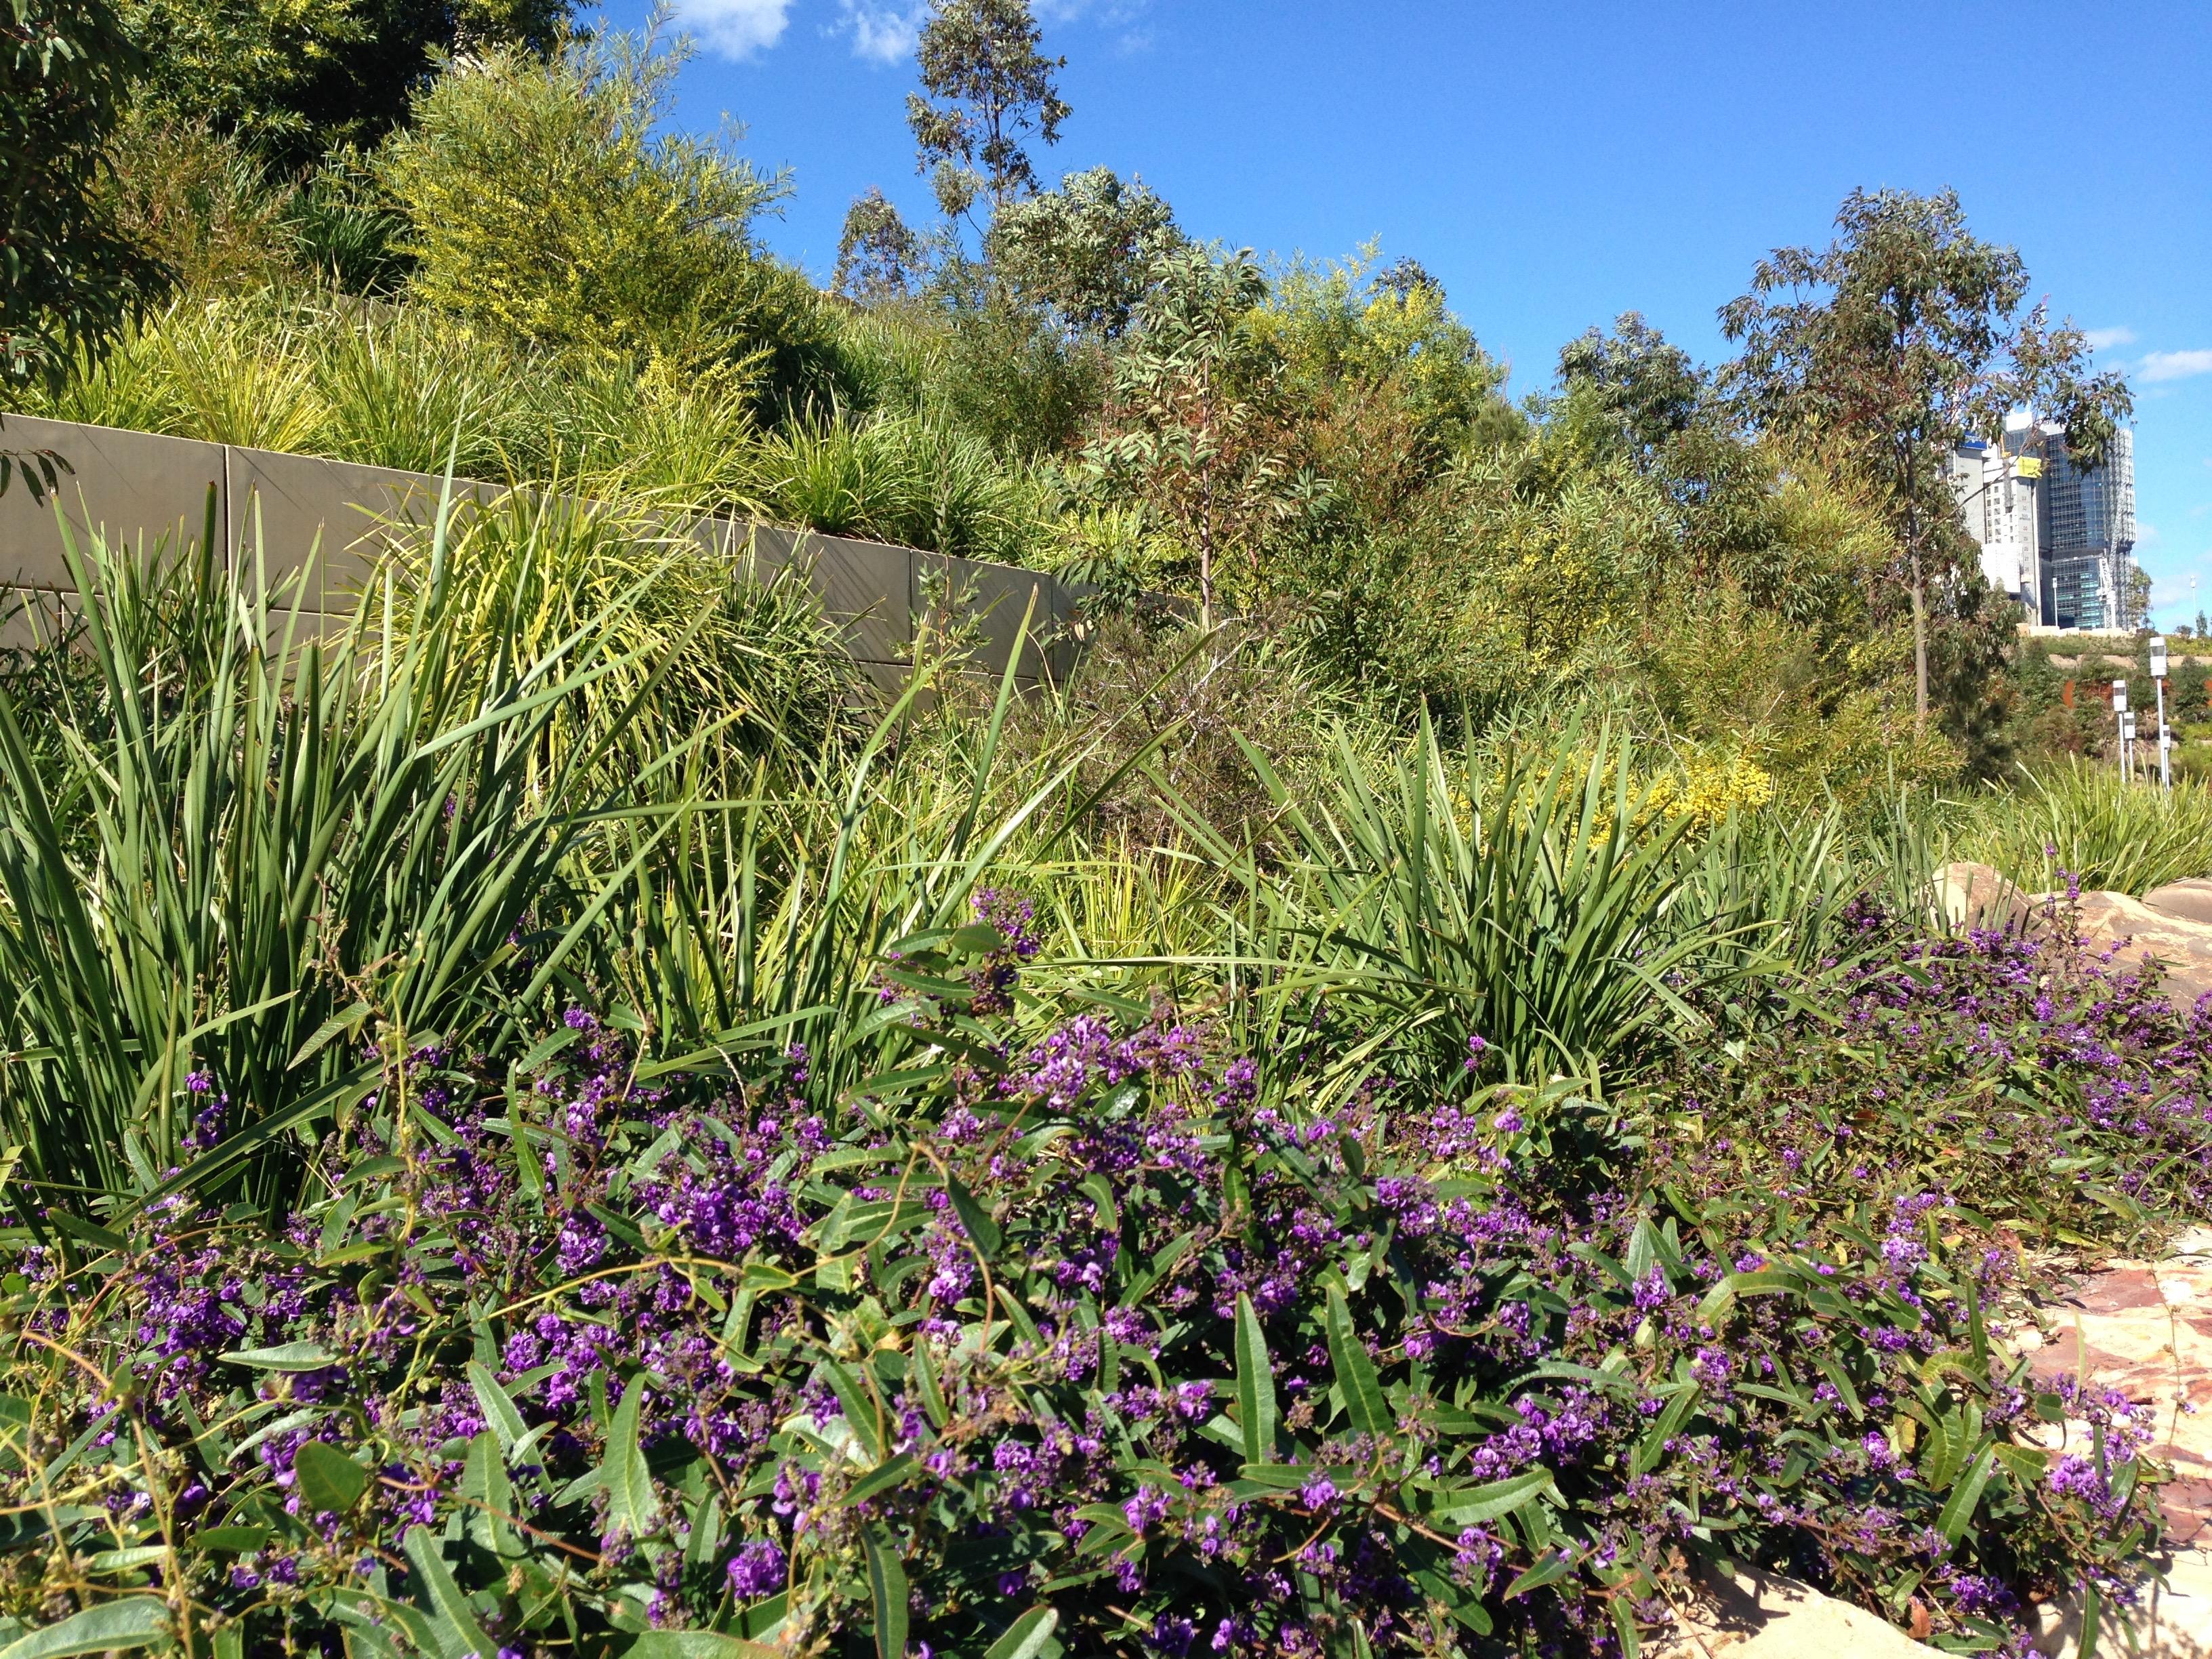 barangaroo reserve sydney indigenous plants australian natives